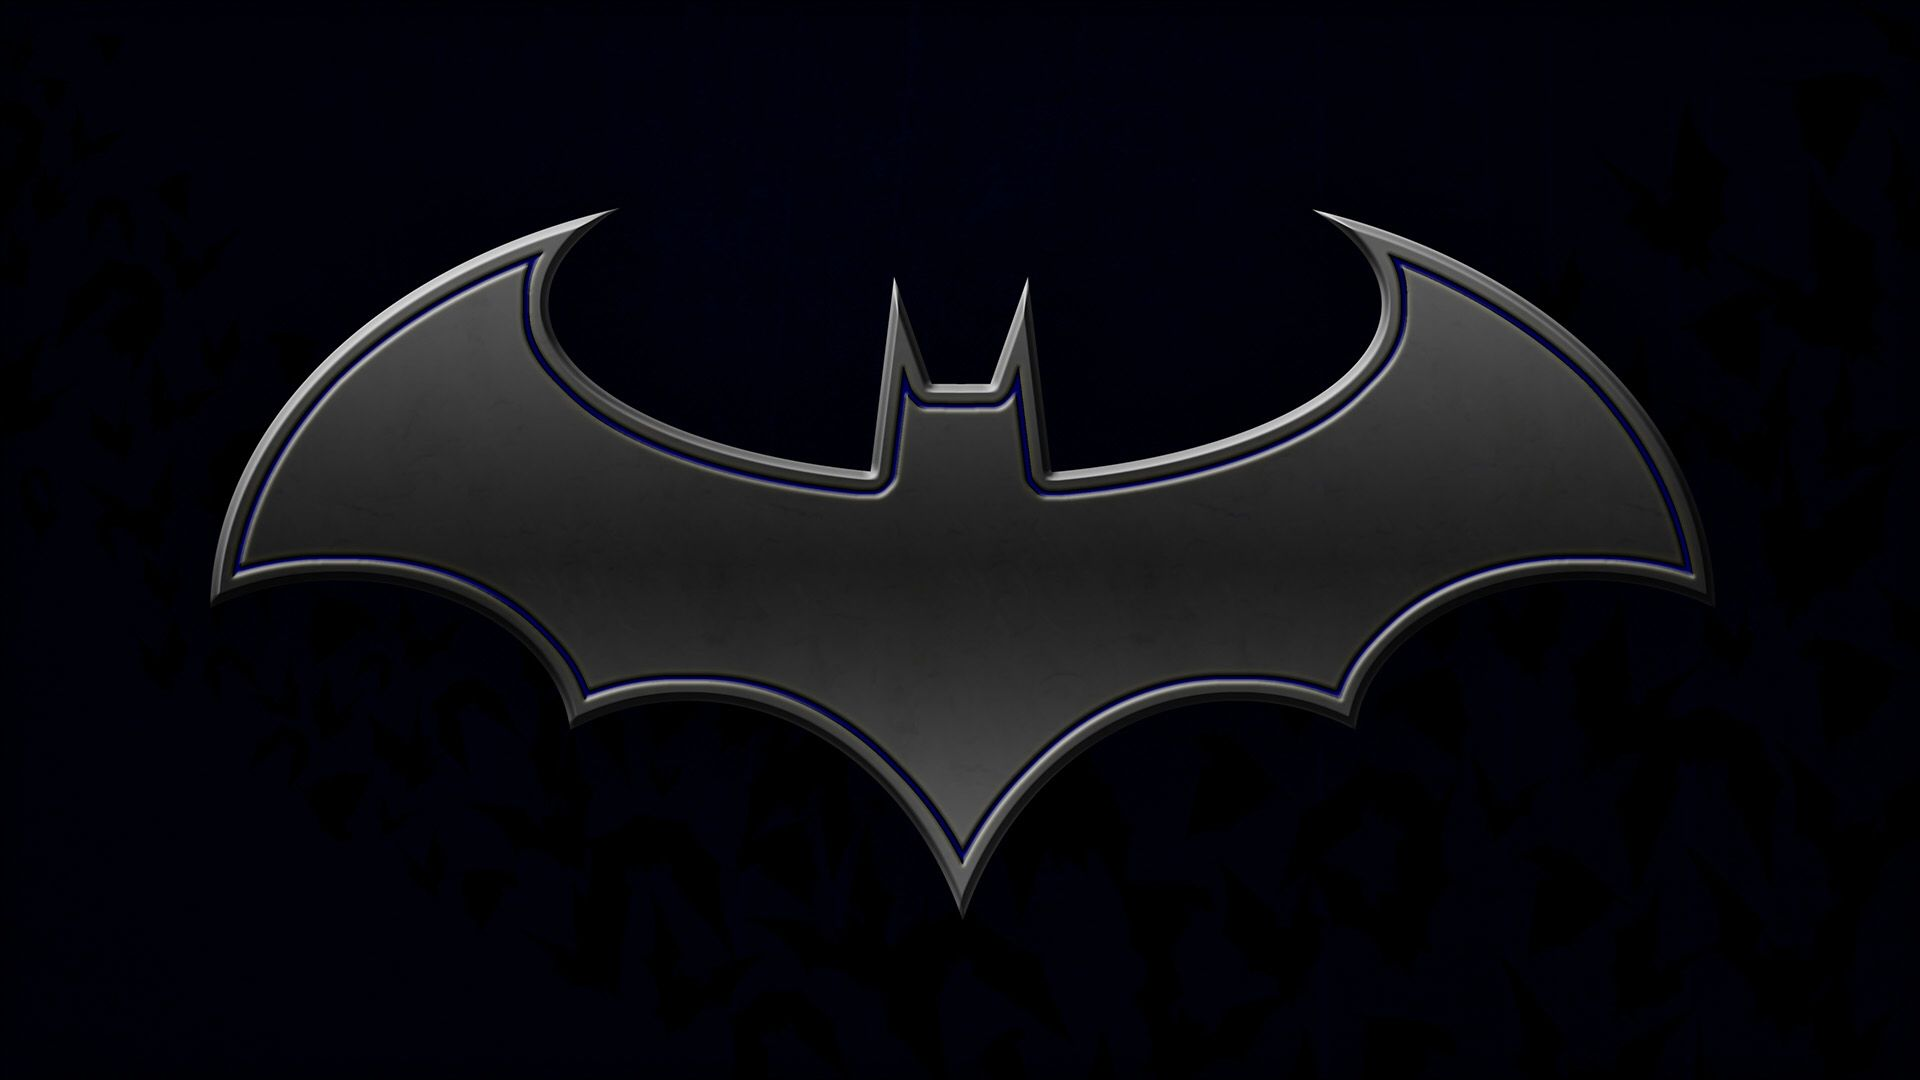 50 Batman Logo Wallpapers For Free Download Hd 1080p Batman Wallpaper Batman Logo Dark Knight Wallpaper